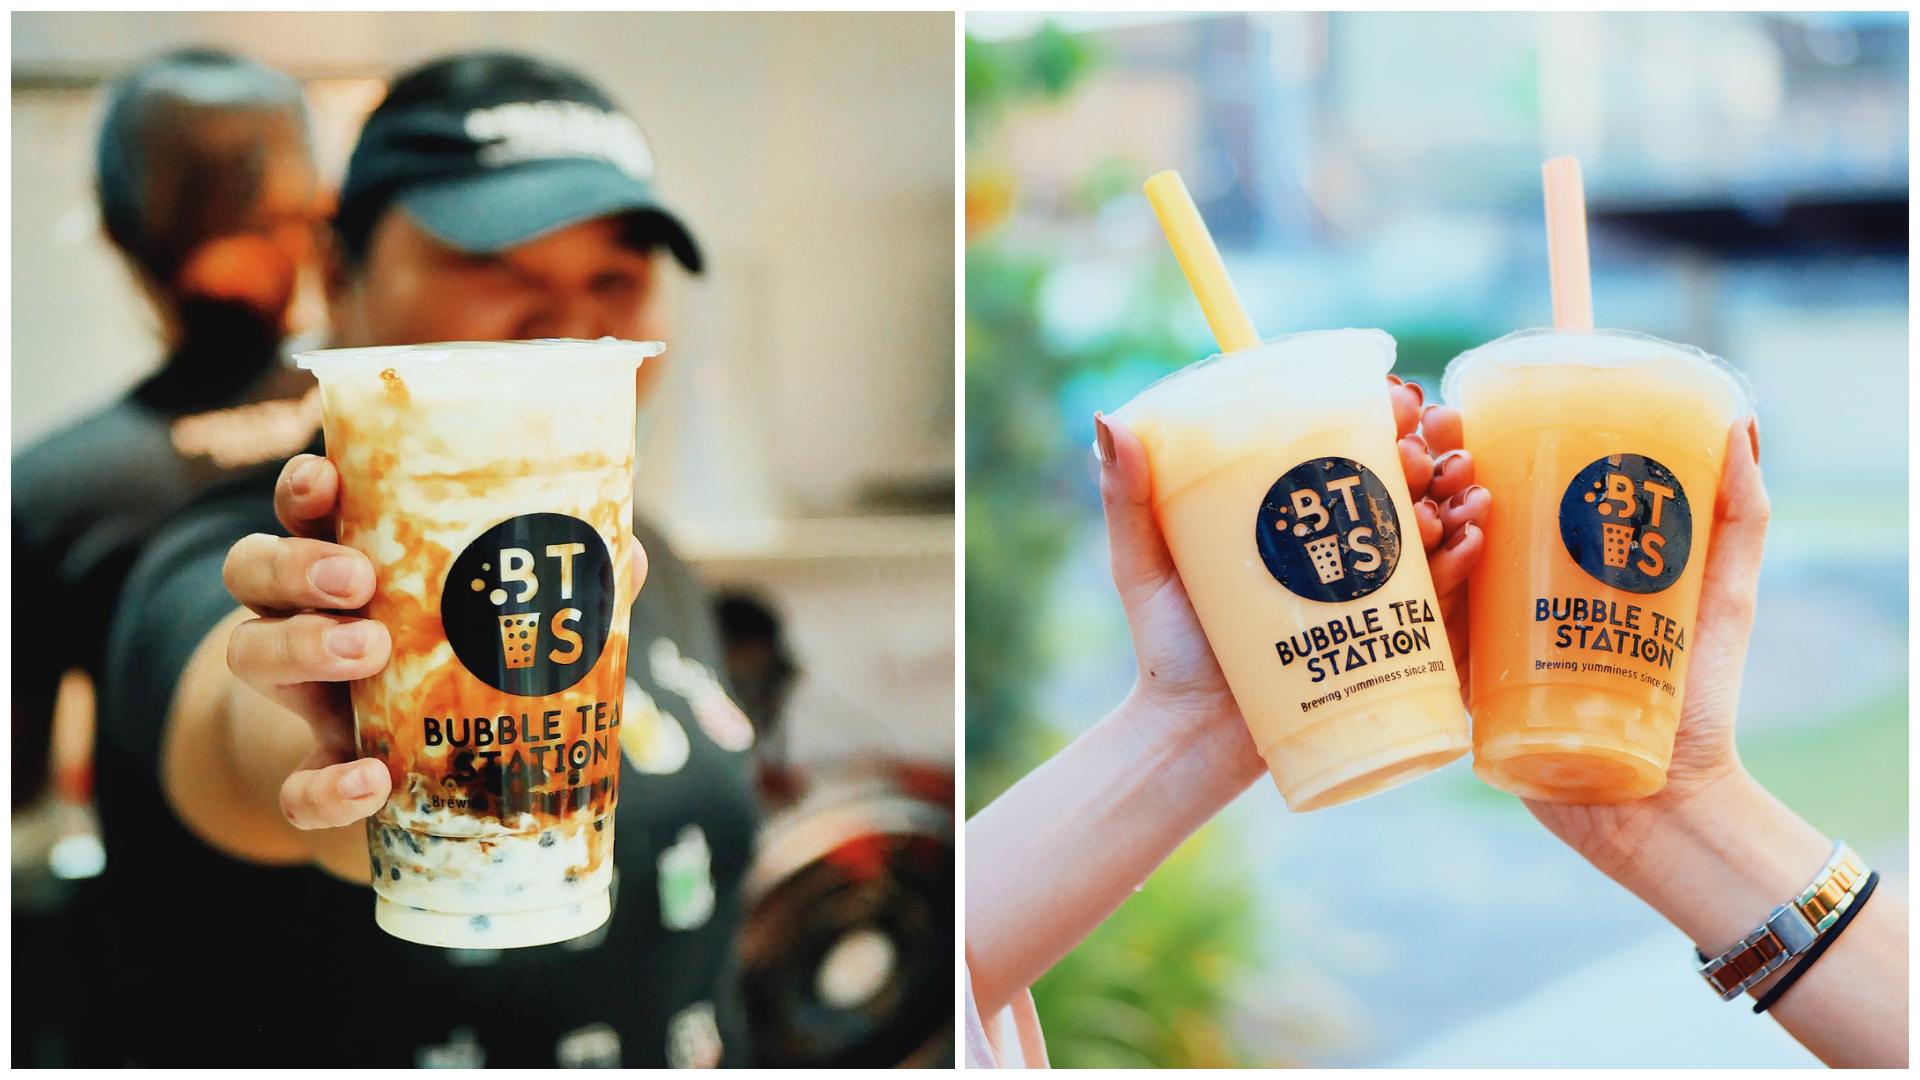 1 Bubble Tea Station Milk Tea Cebu